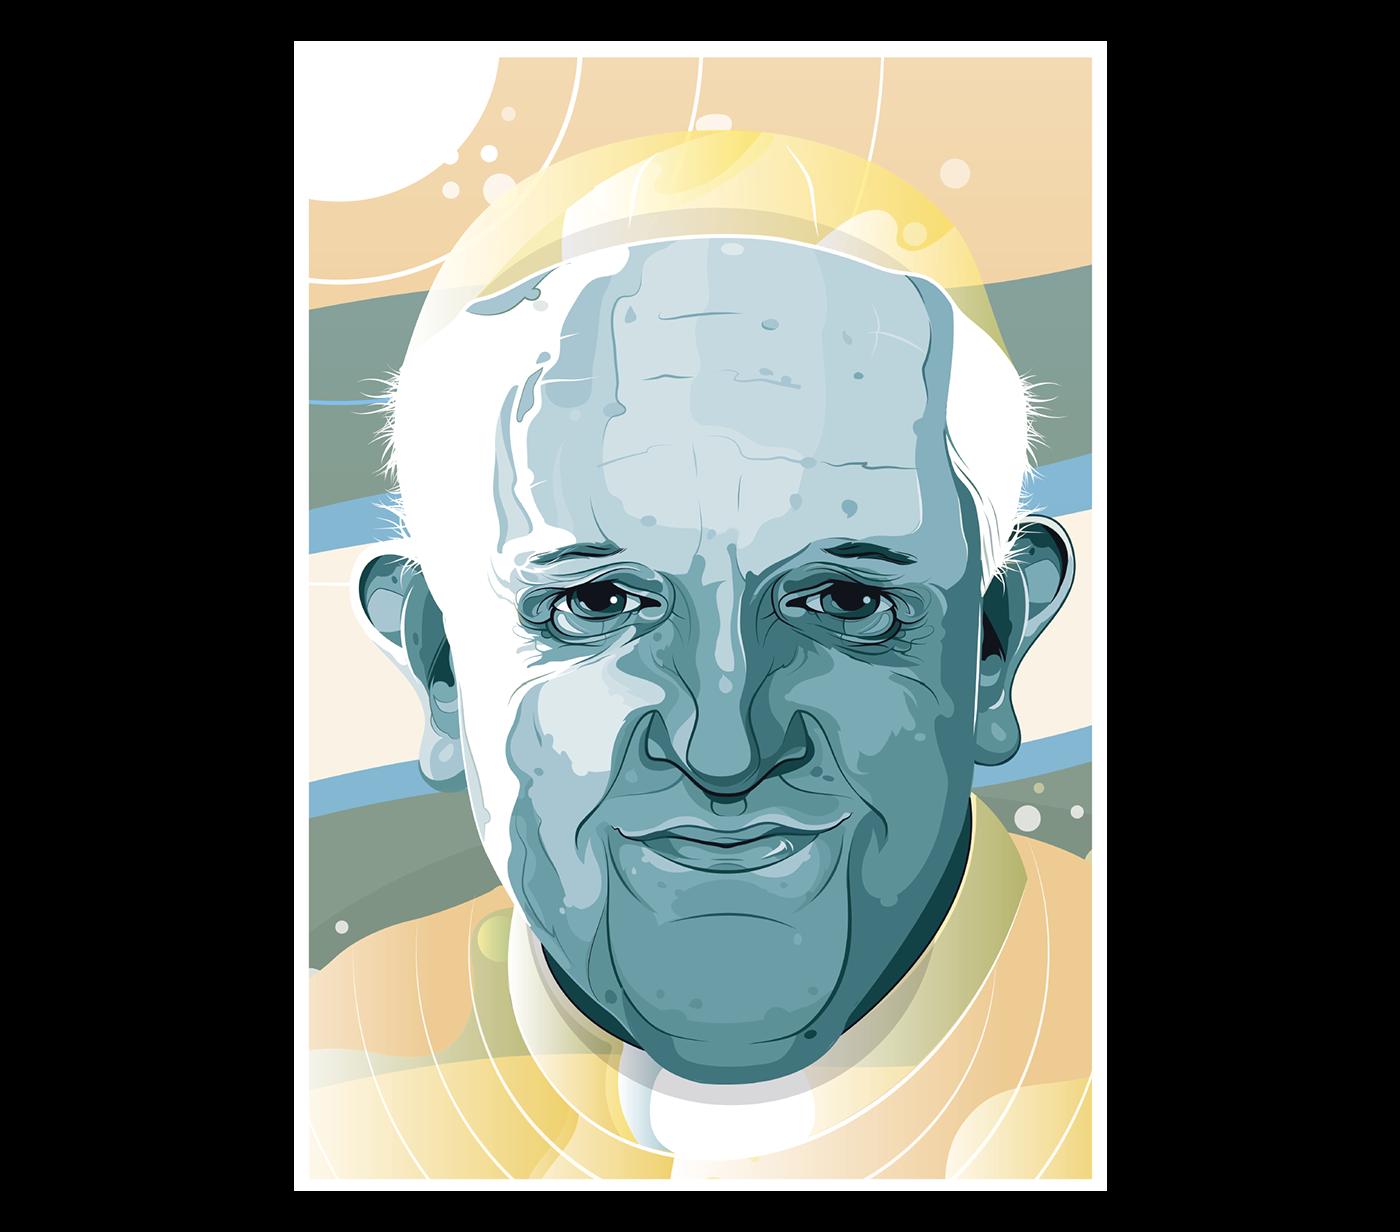 papa francisco Pope Francis